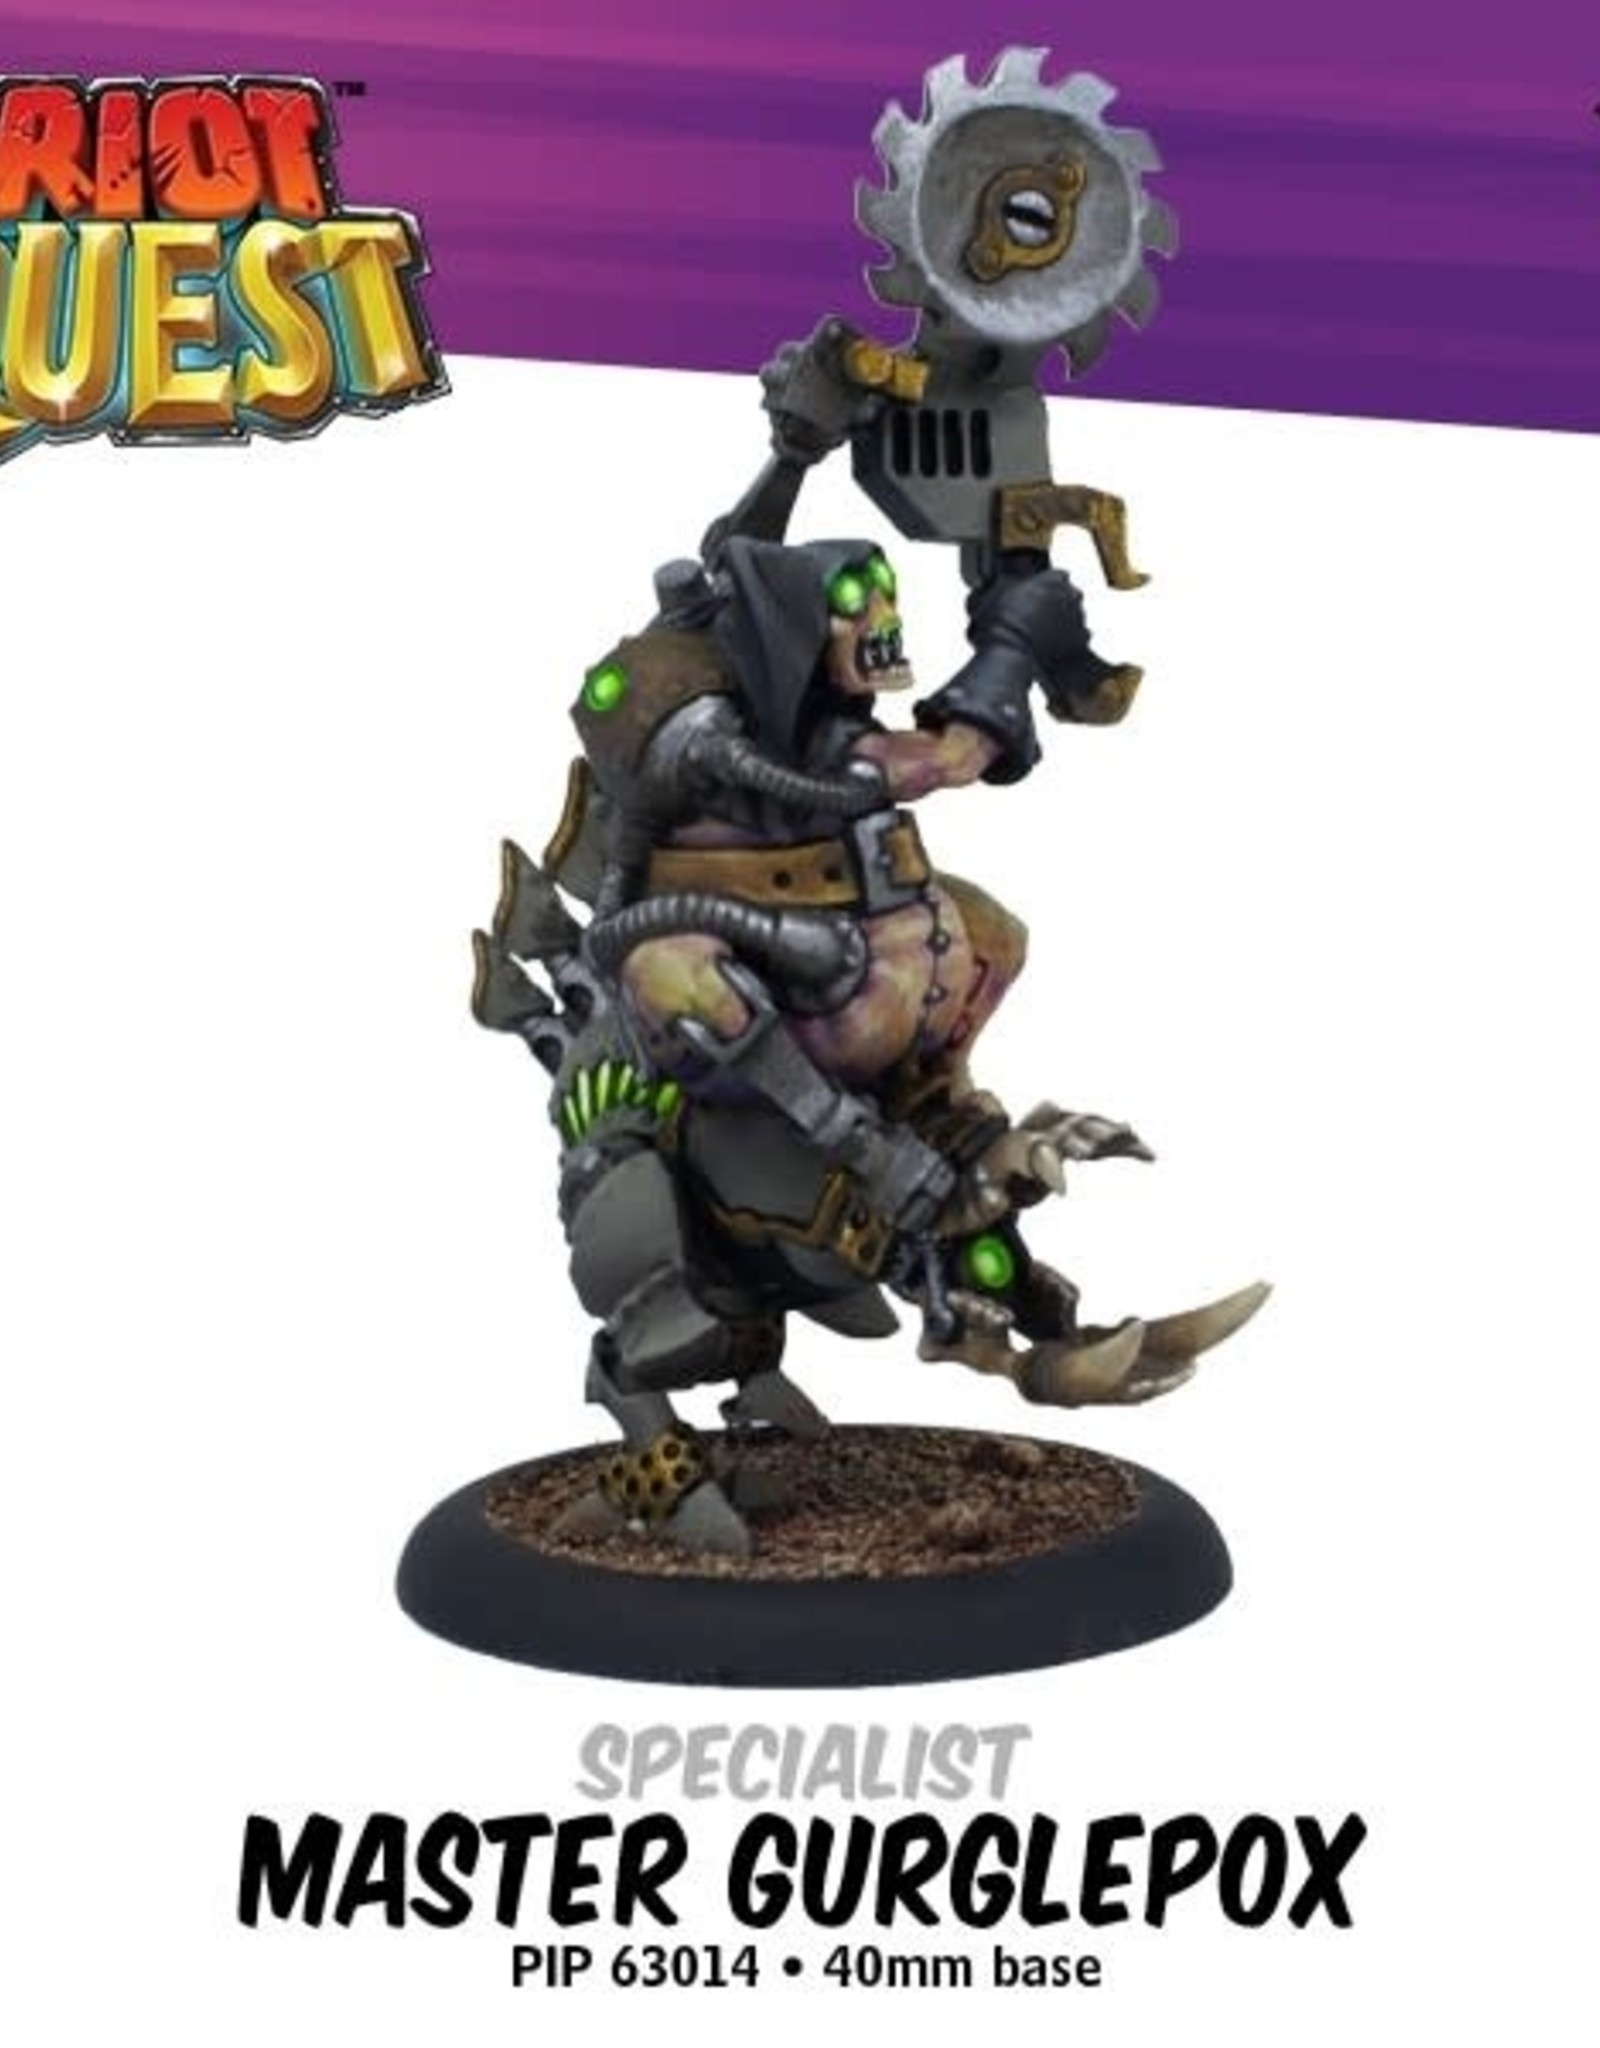 Privateer Press Riot Quest Master Gurglepox